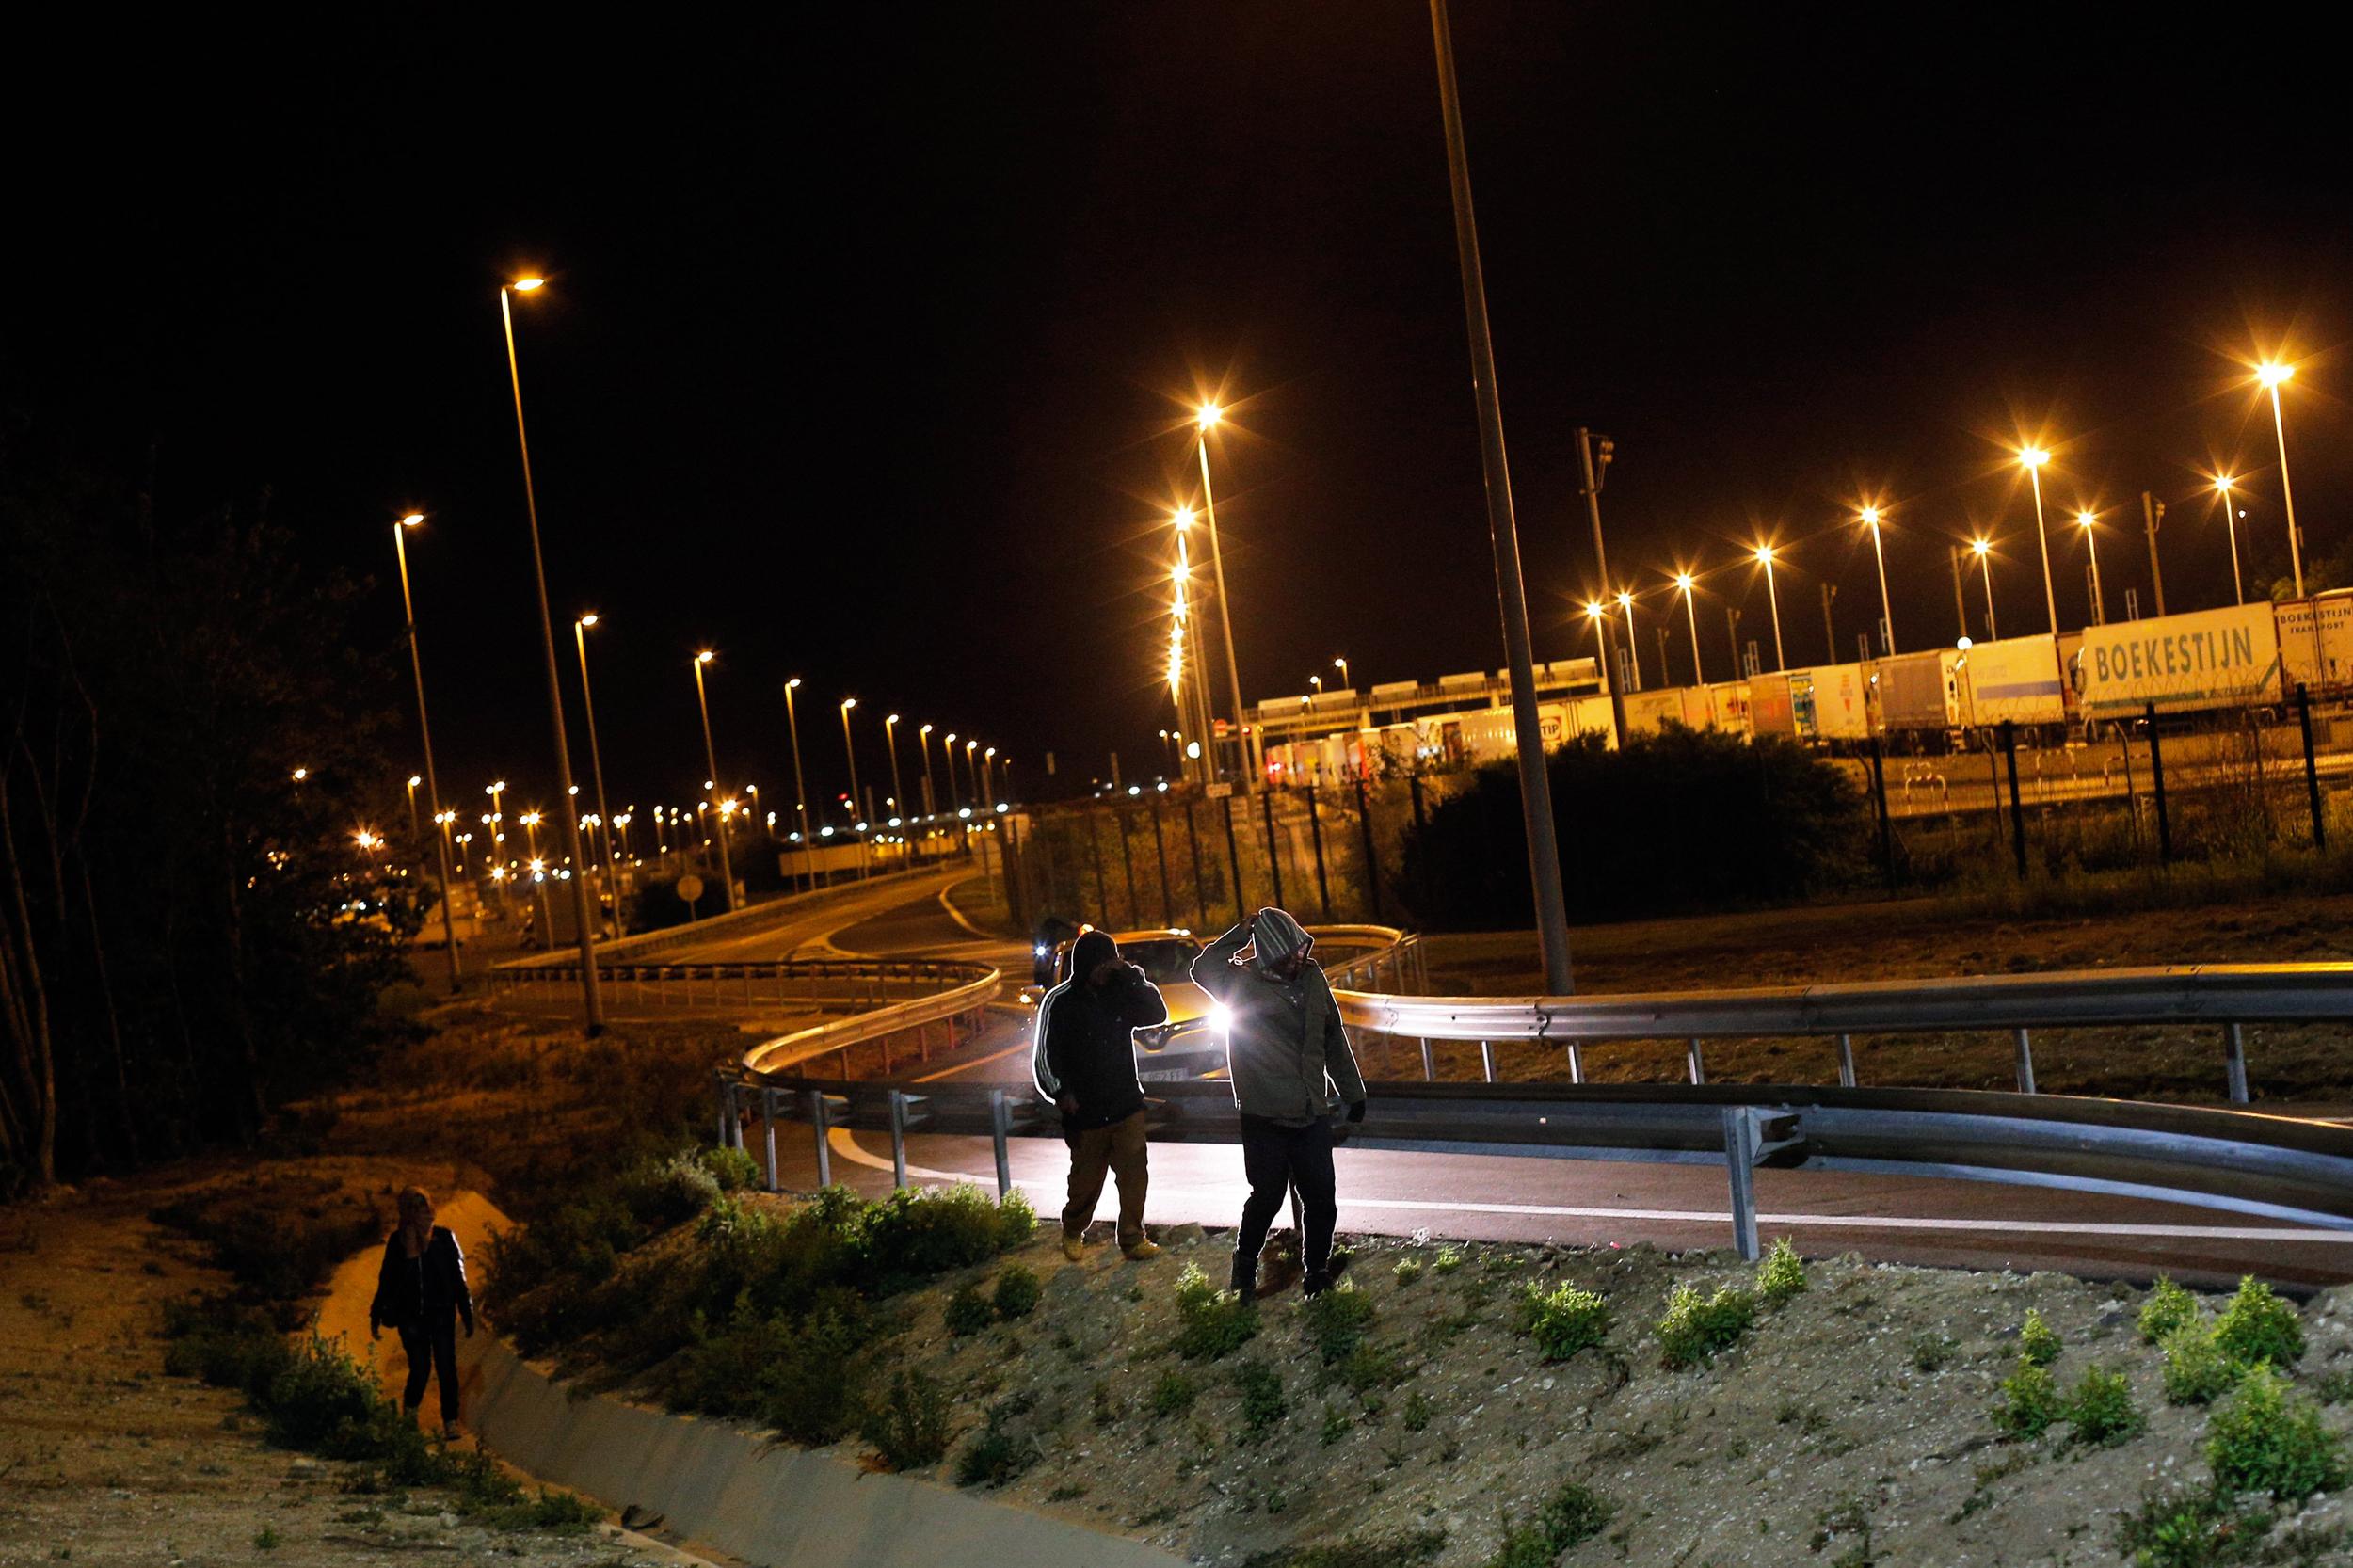 Migrants Attempt Journey Through Eurotunnel